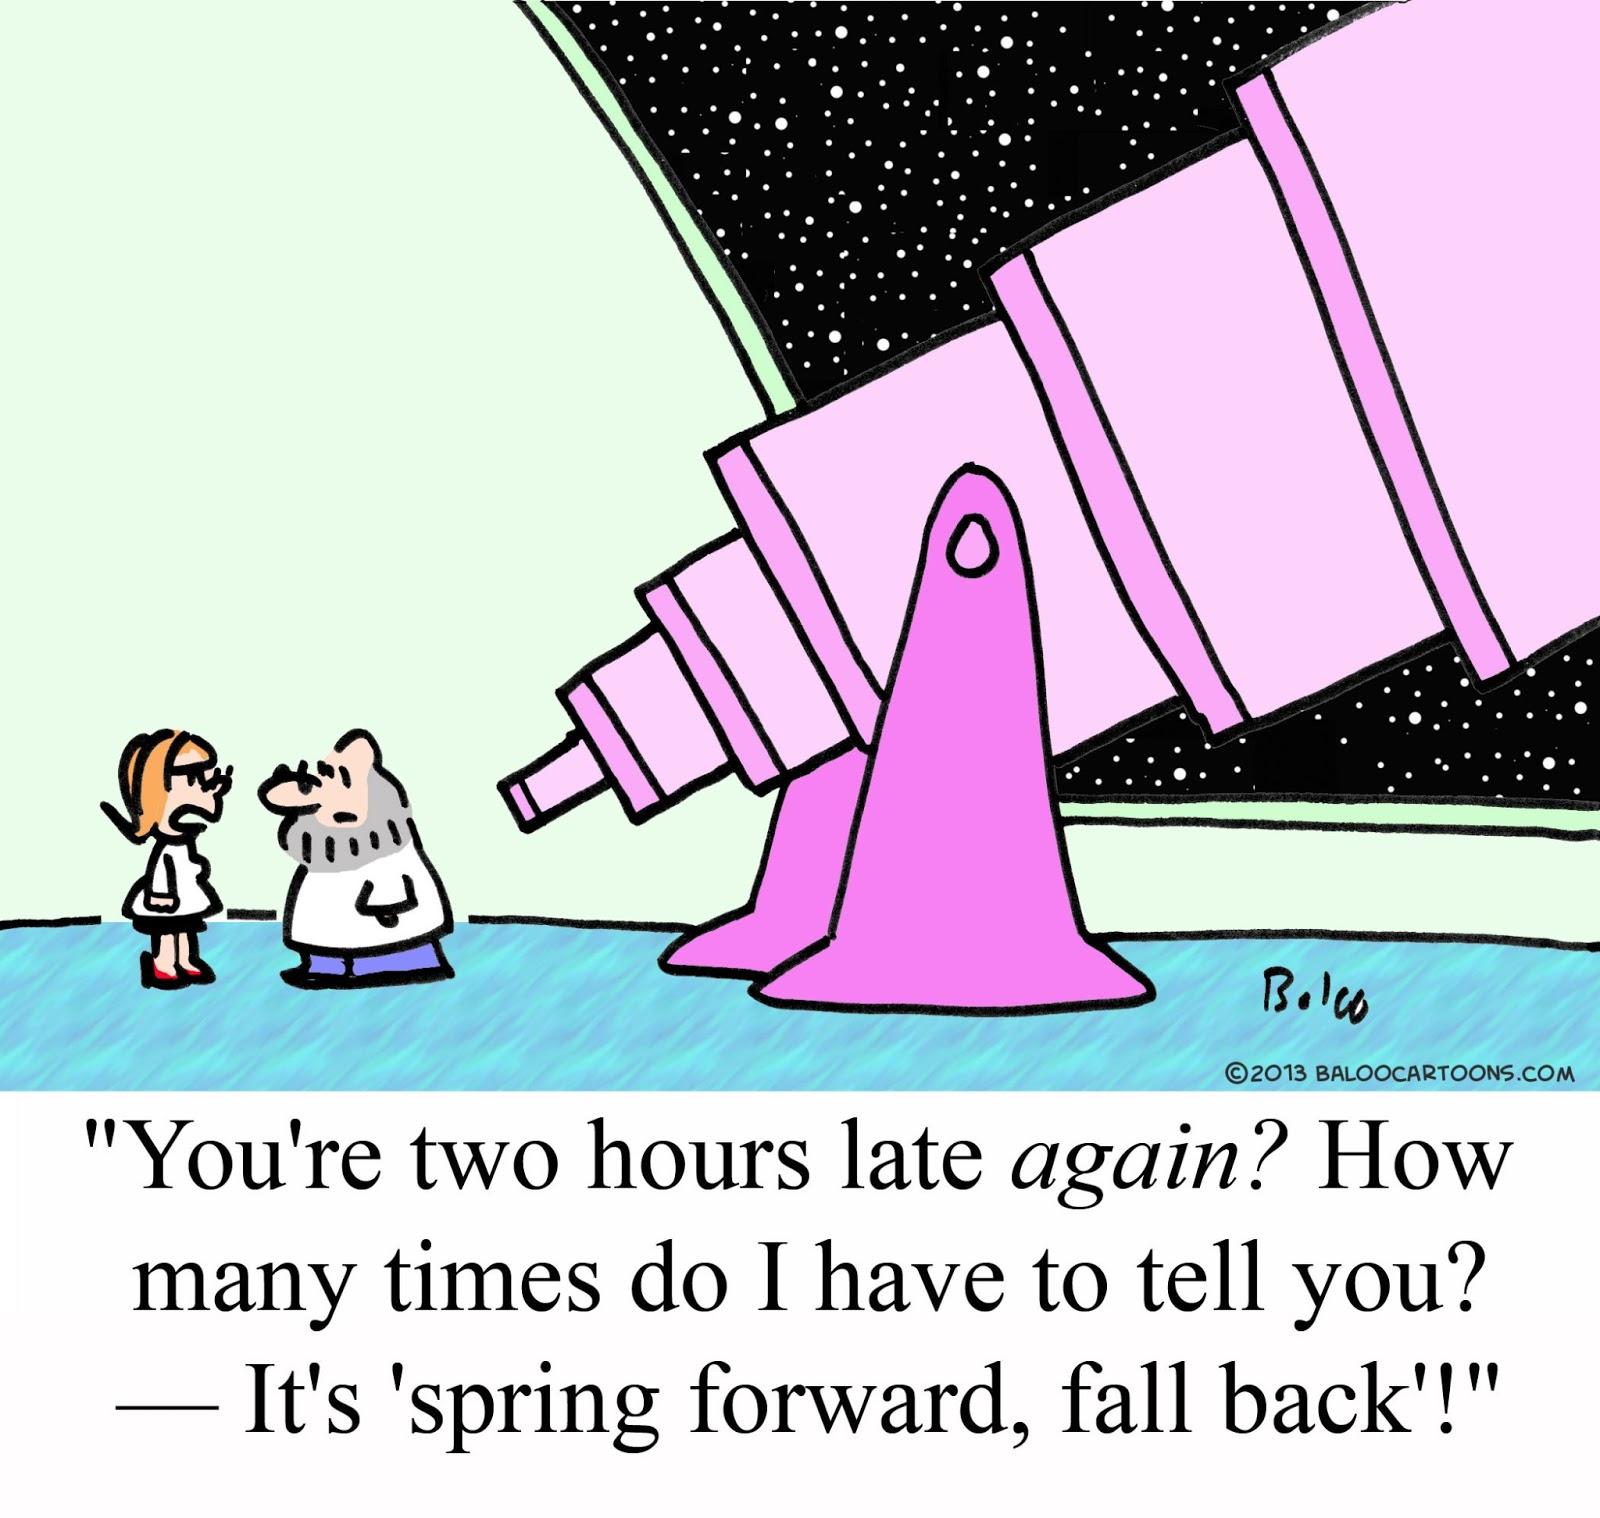 baloo s non political cartoon blog daylight savings time cartoon